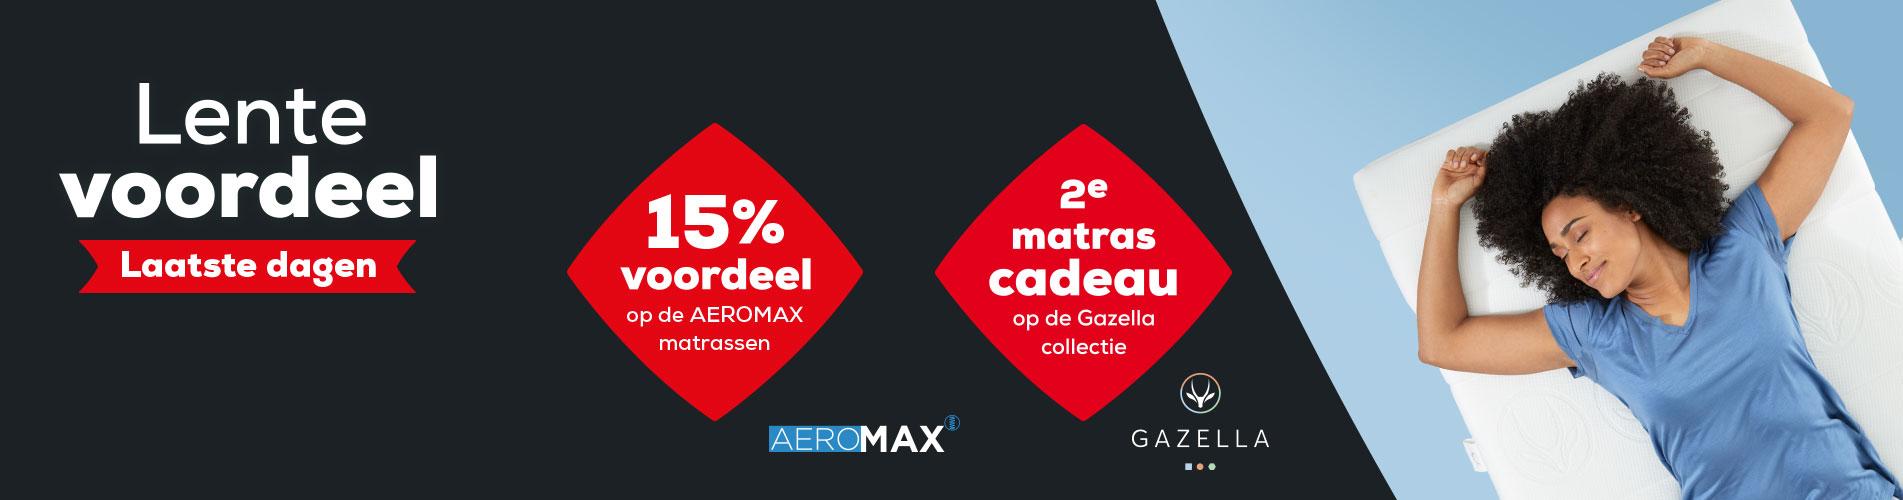 AEROMAX en Gazella Matrassen Actie | Swiss Sense